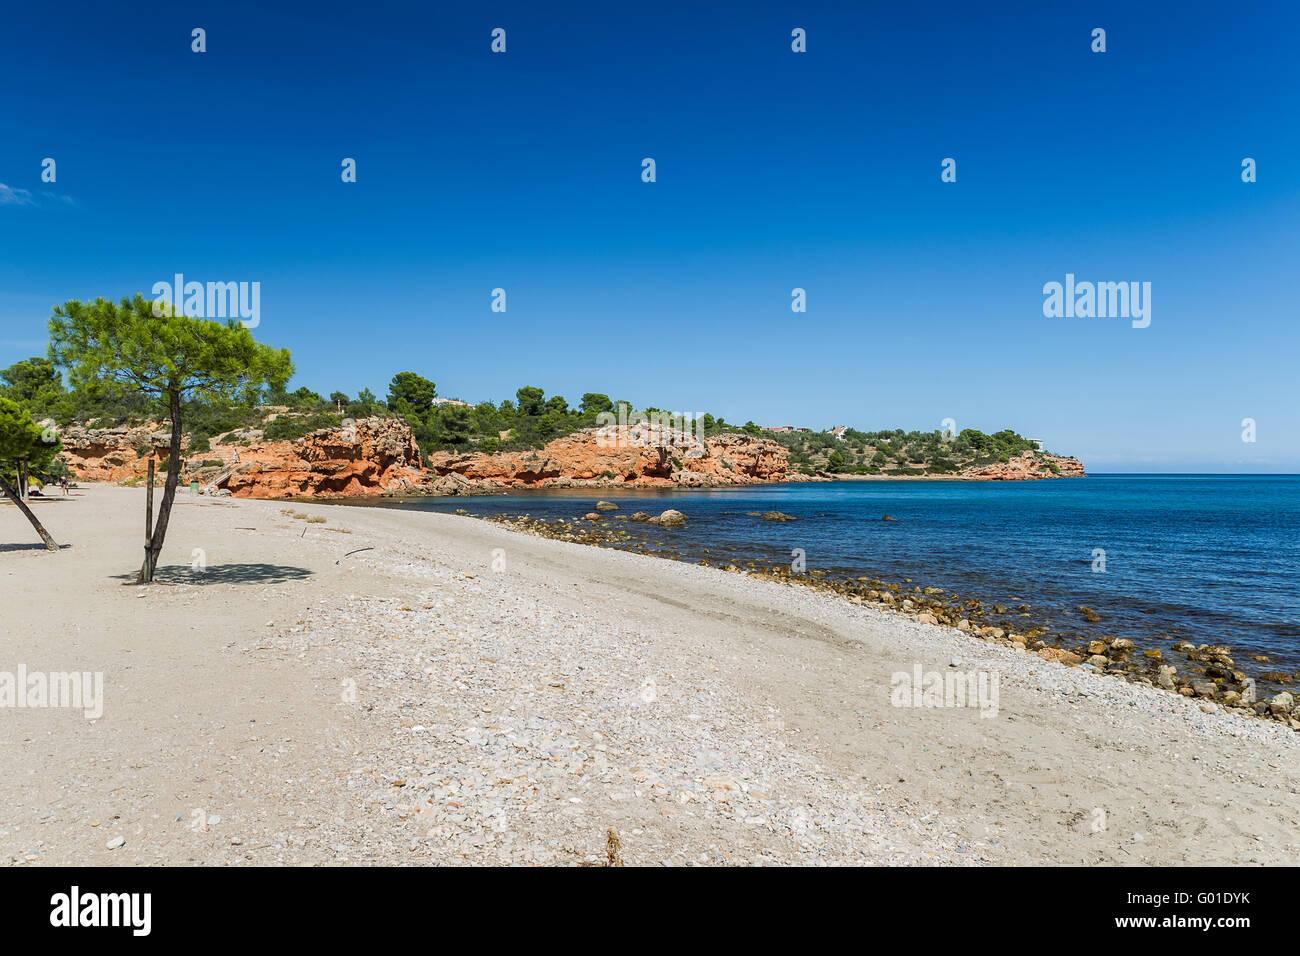 The beach of the Mediterranean Sea - Stock Image